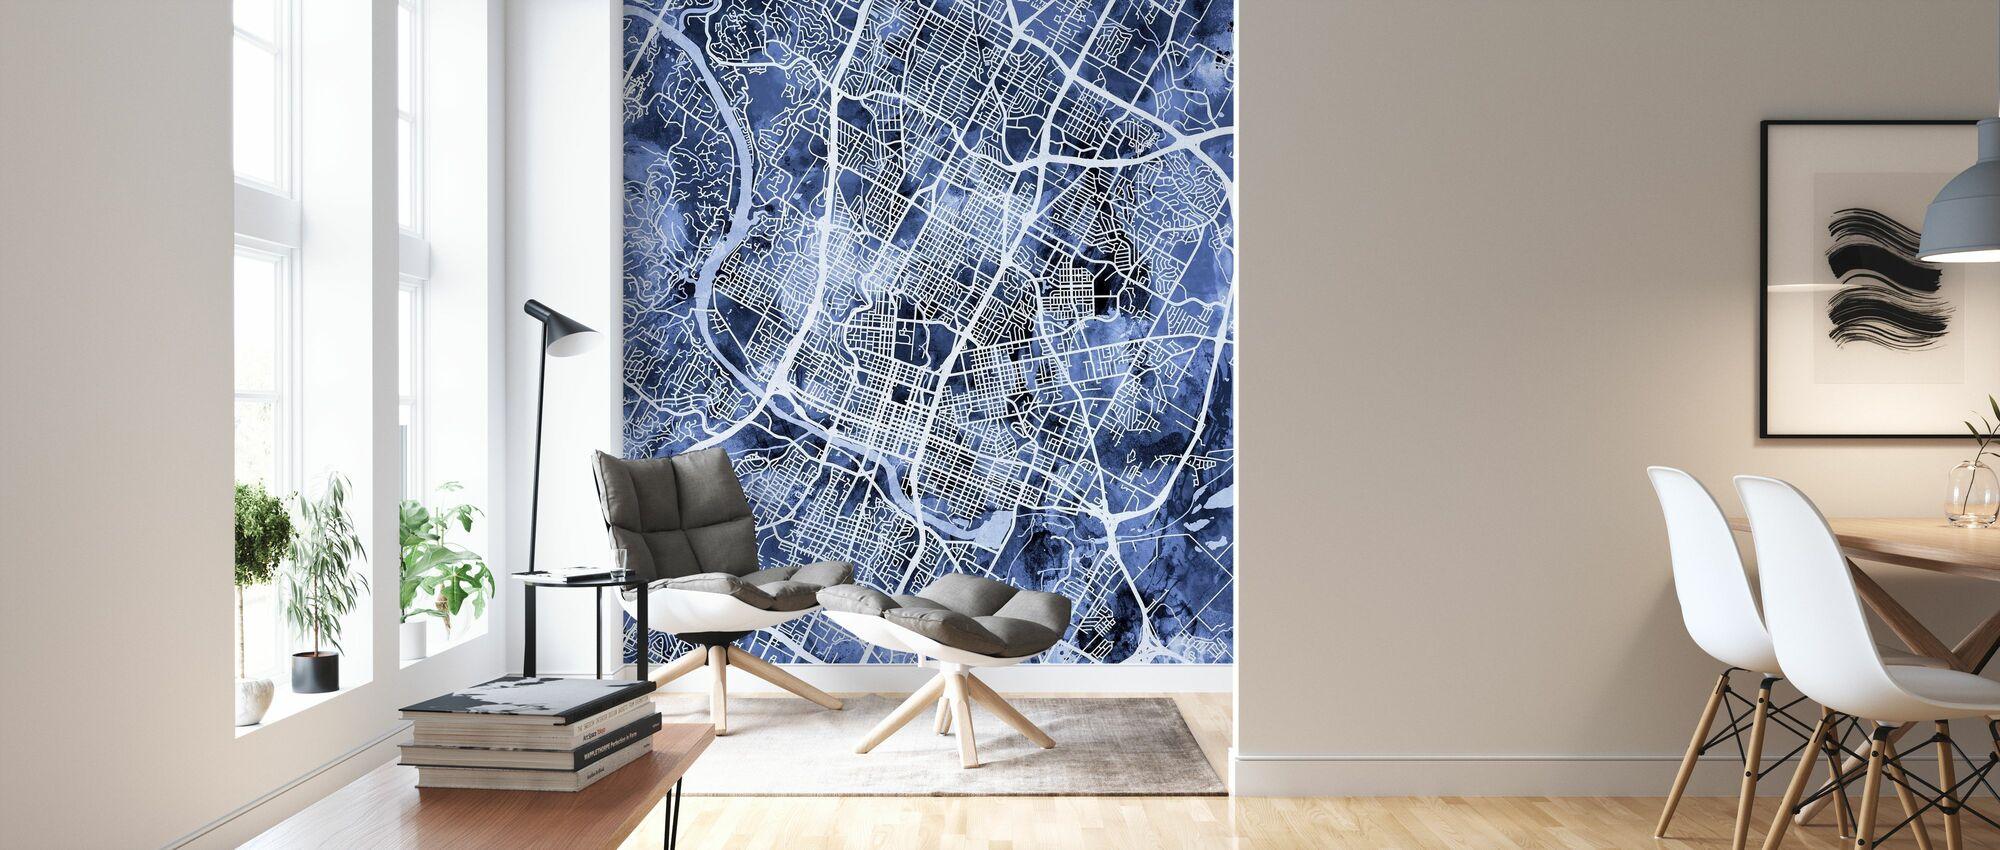 Austin Texas City Map - Wallpaper - Living Room